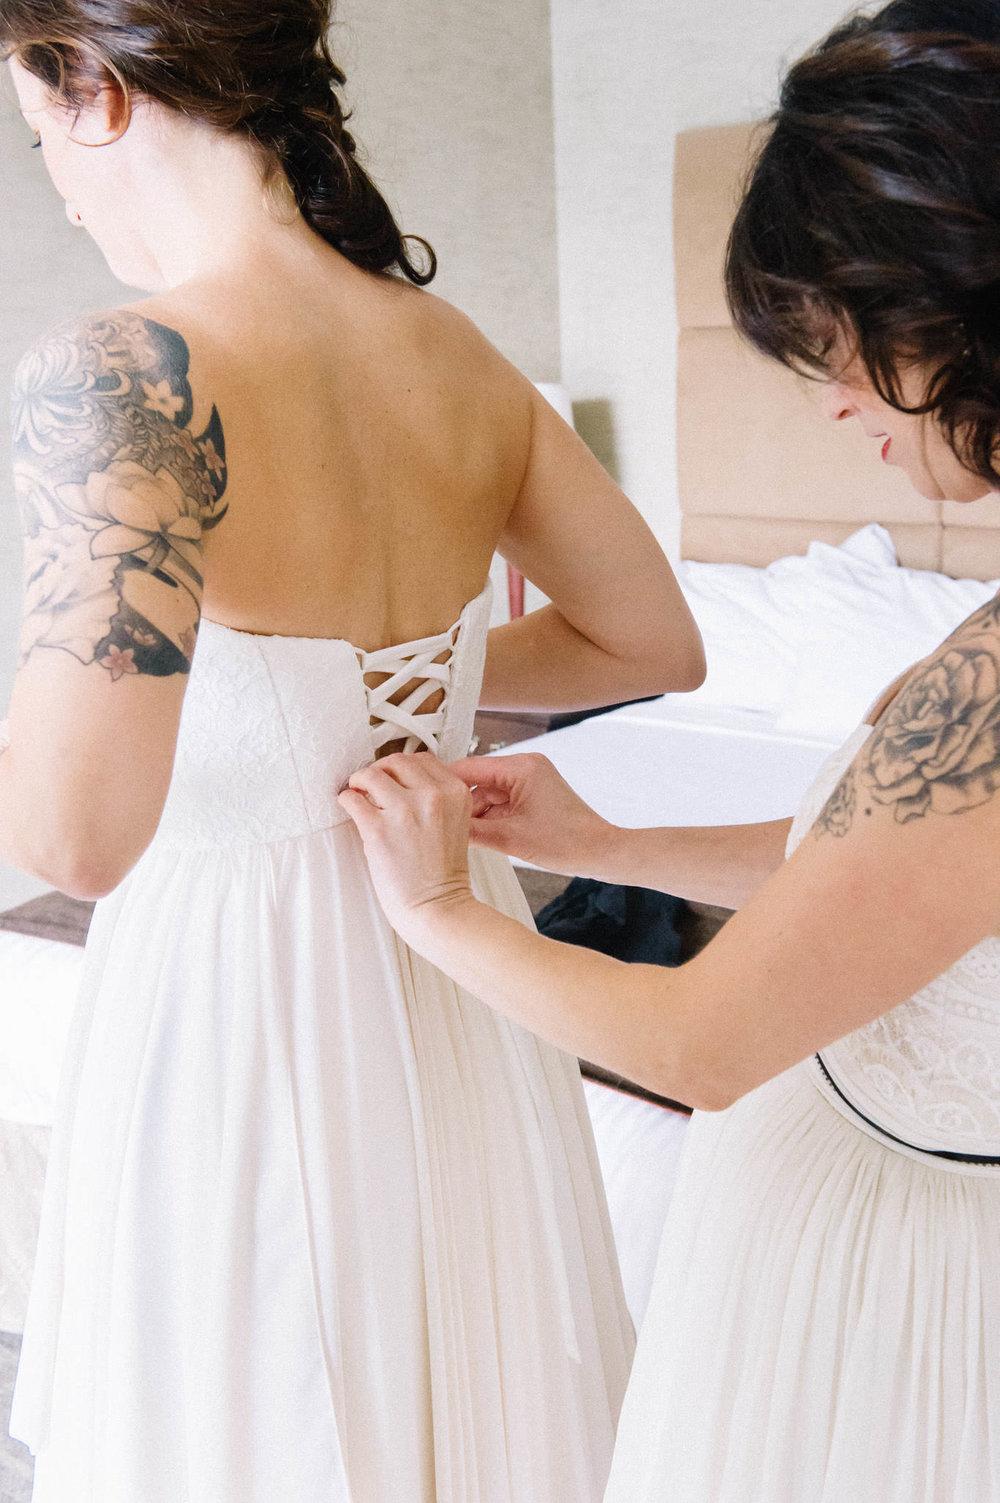 Vancouver LGBT wedding photography